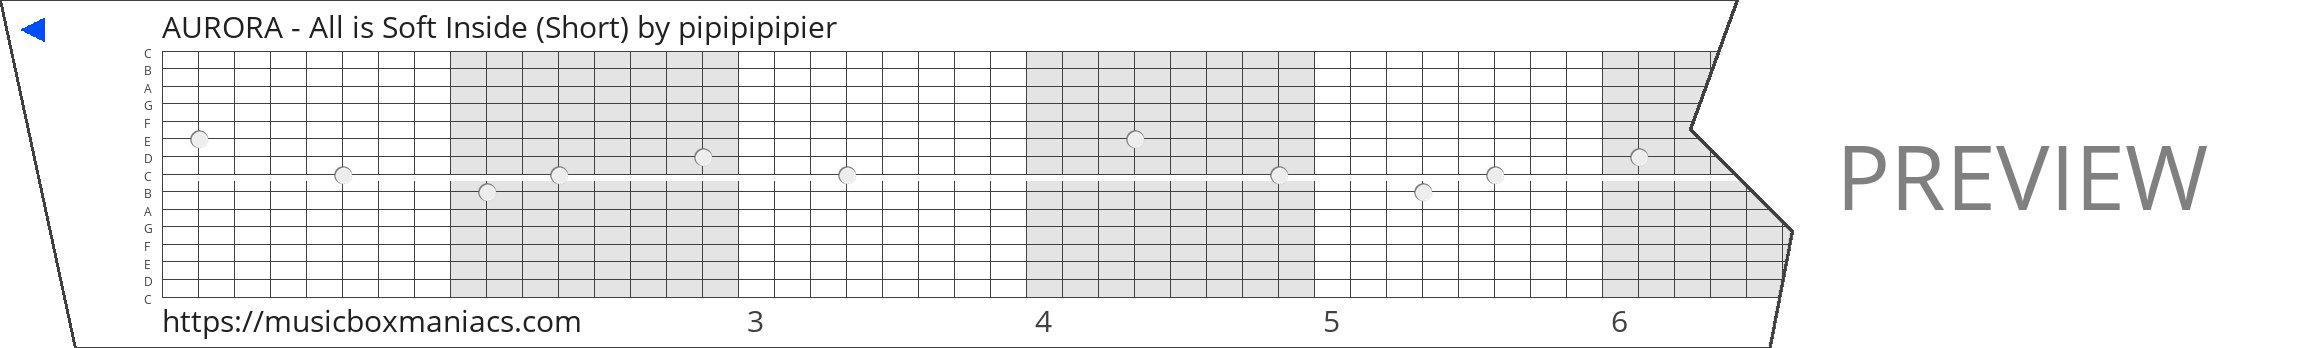 AURORA - All is Soft Inside (Short) 15 note music box paper strip